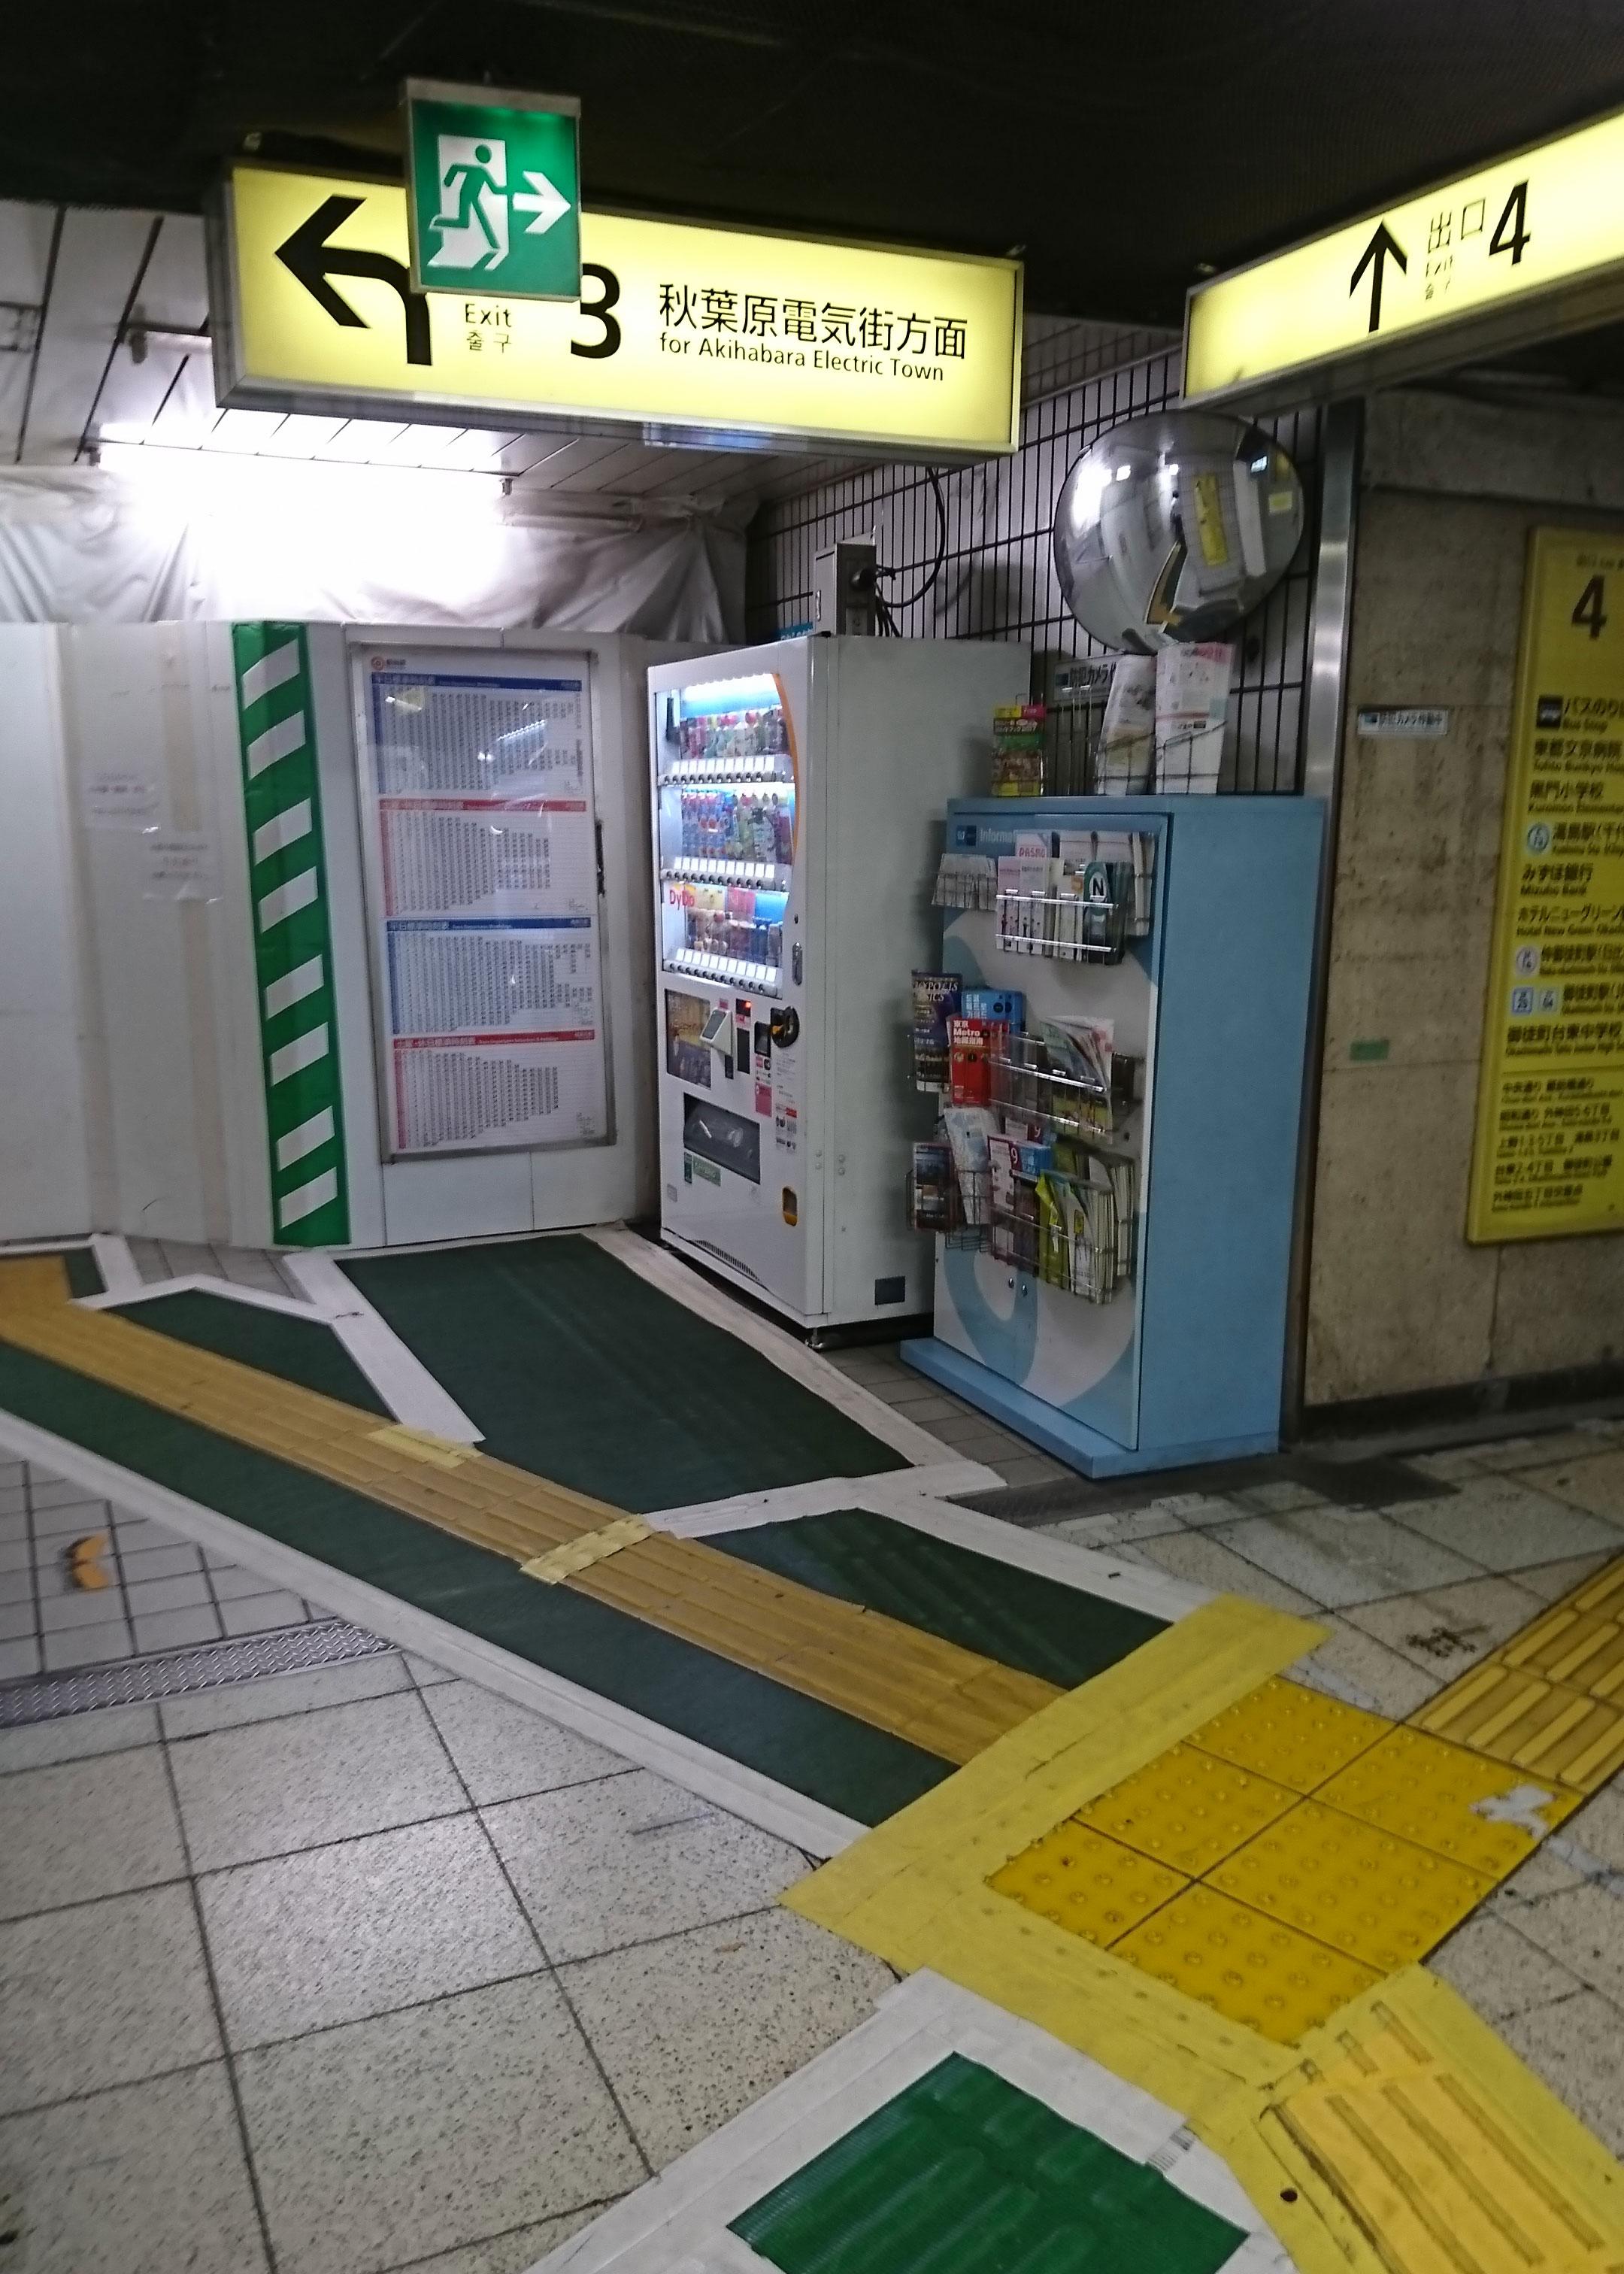 写真4・末広町駅(浅草方面行き側)の地下